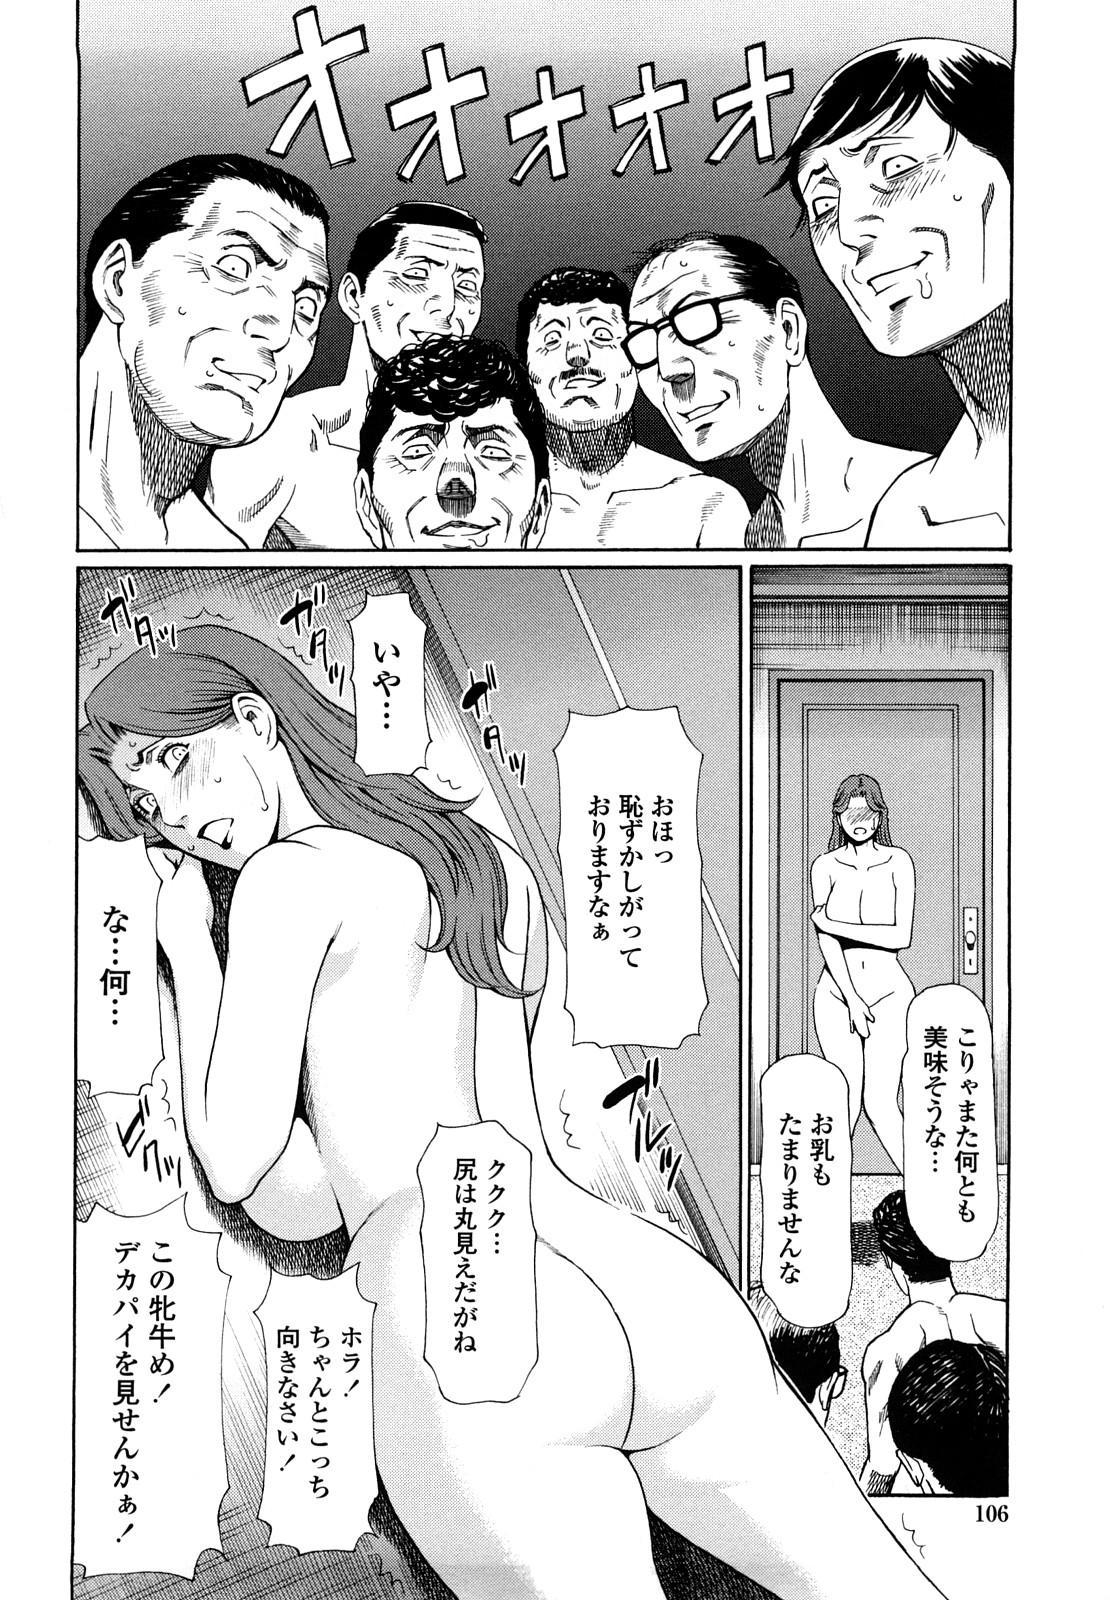 [Takasugi Kou] Kindan no Haha-Ana - Immorality Love-Hole [Decensored] 107